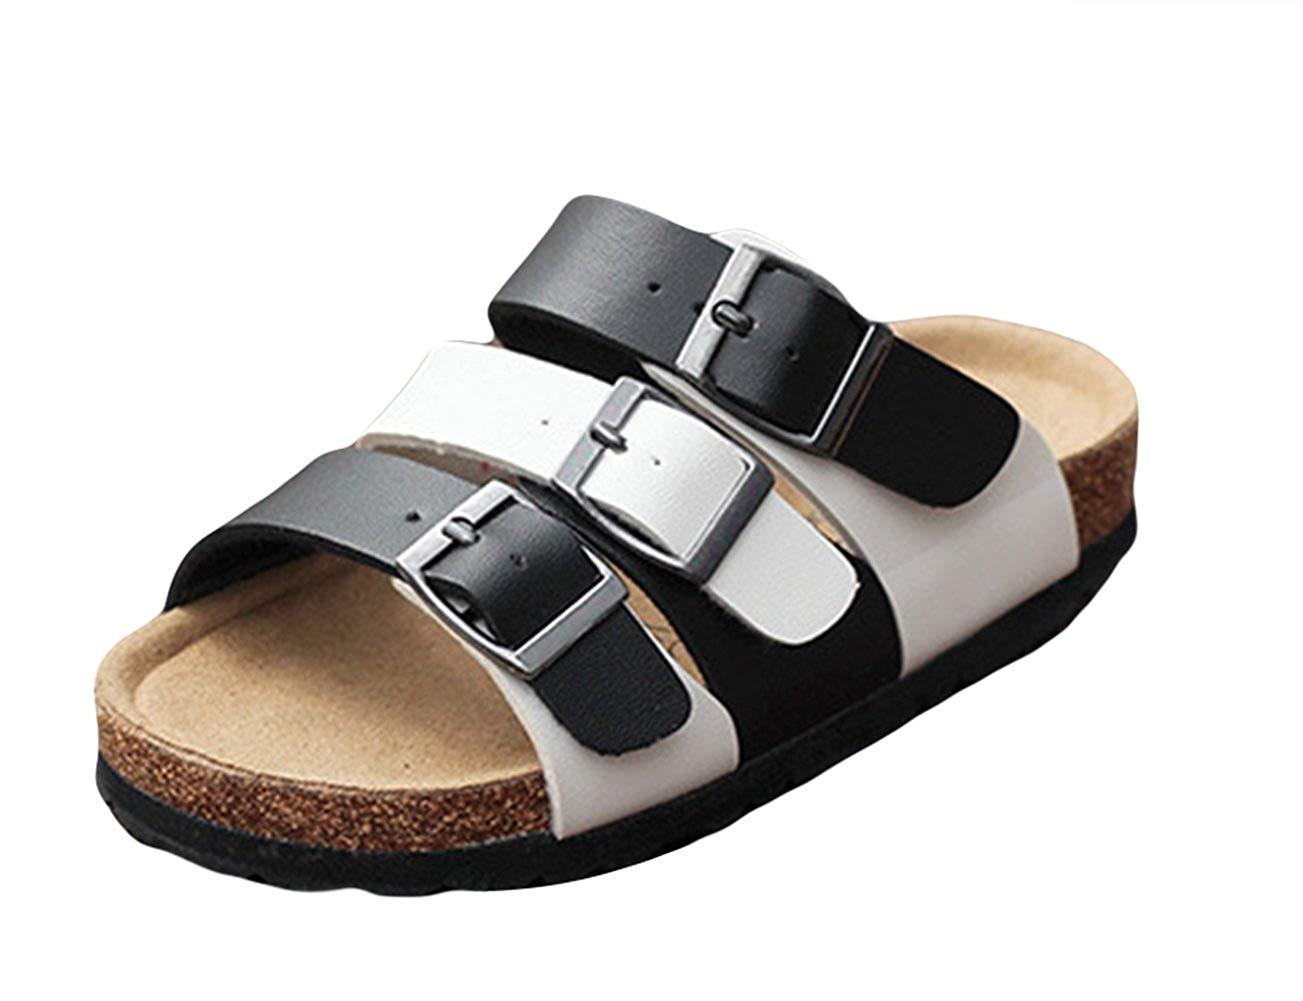 c27449e2272f Get Quotations · Liveinu Boys Girls Casual Sandal Fashion PU Leather Buckle  Footbed Flat Flip-Flops Cork Sandals